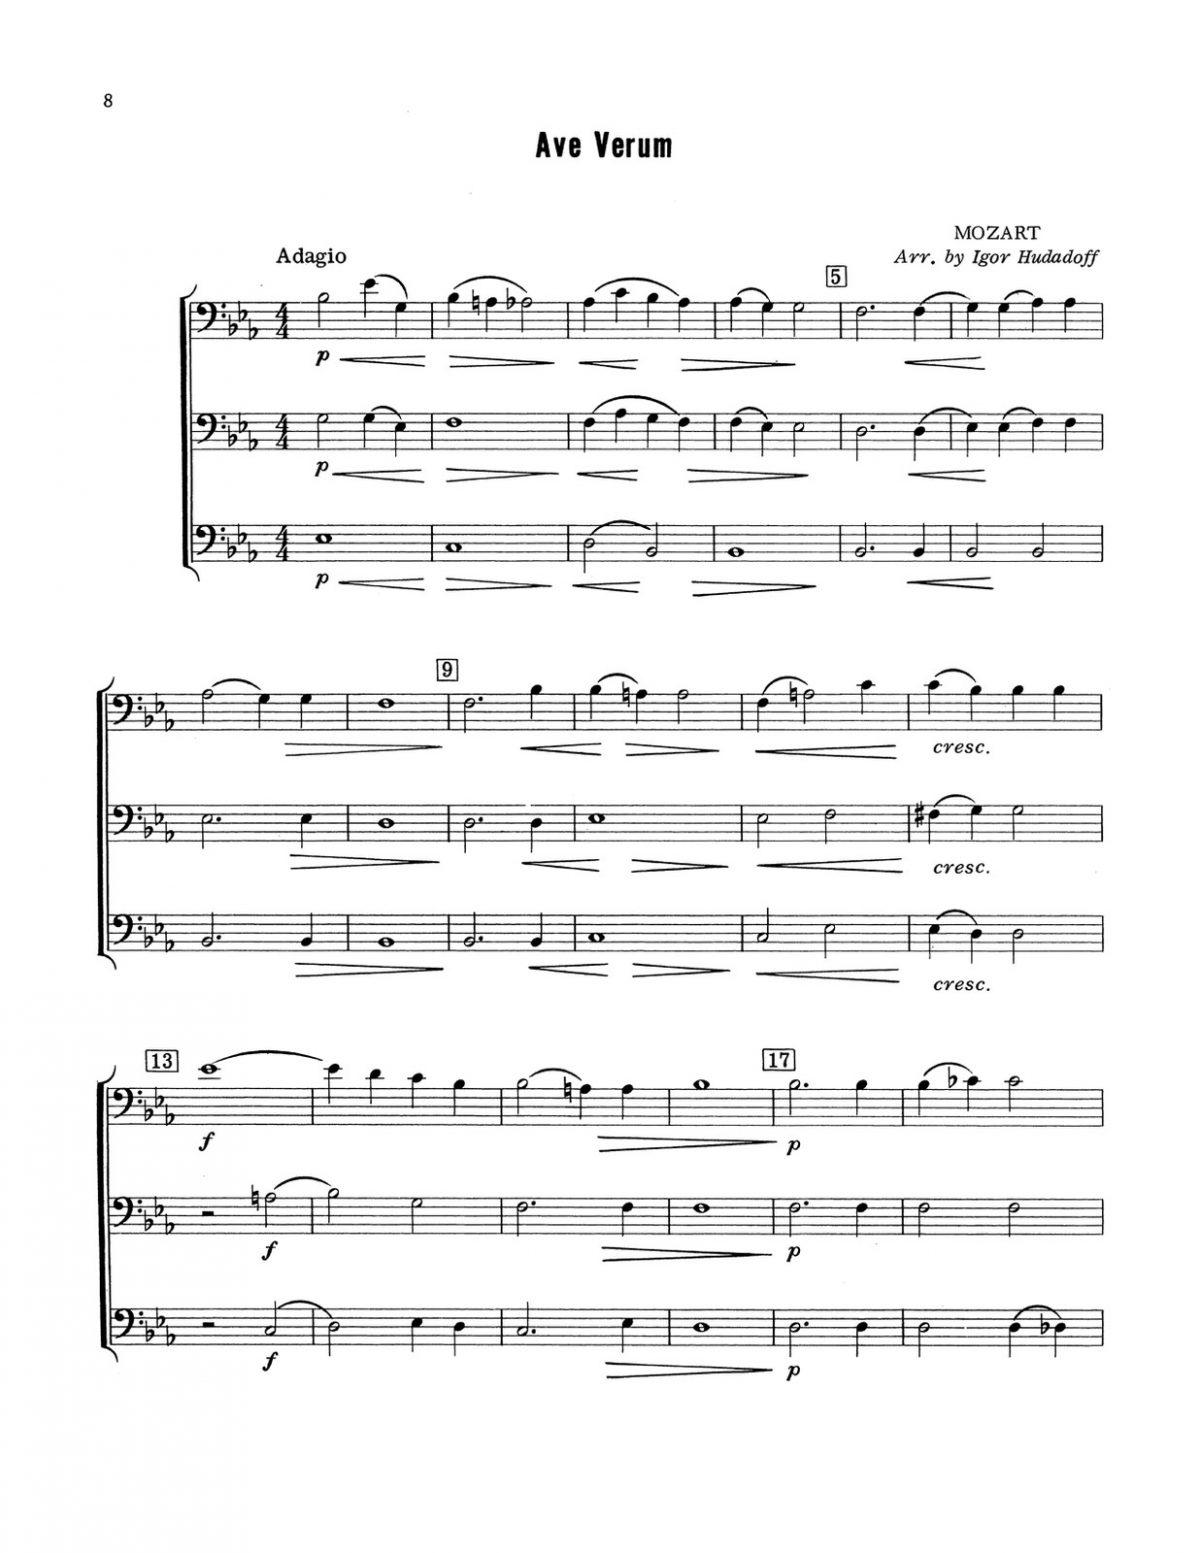 Hudadoff, 24 Trombone Trios-p10